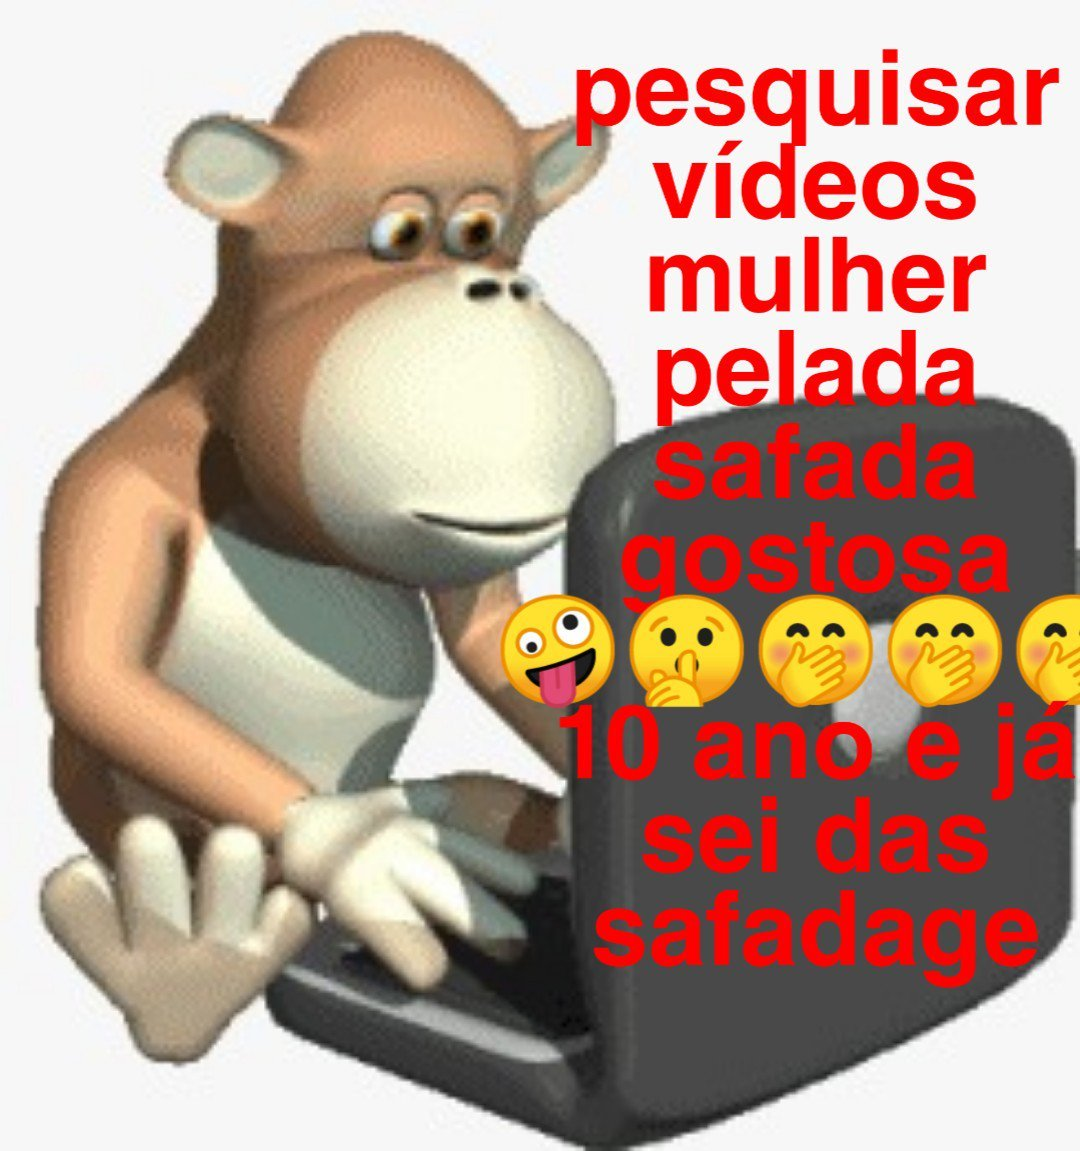 10:53 - meme